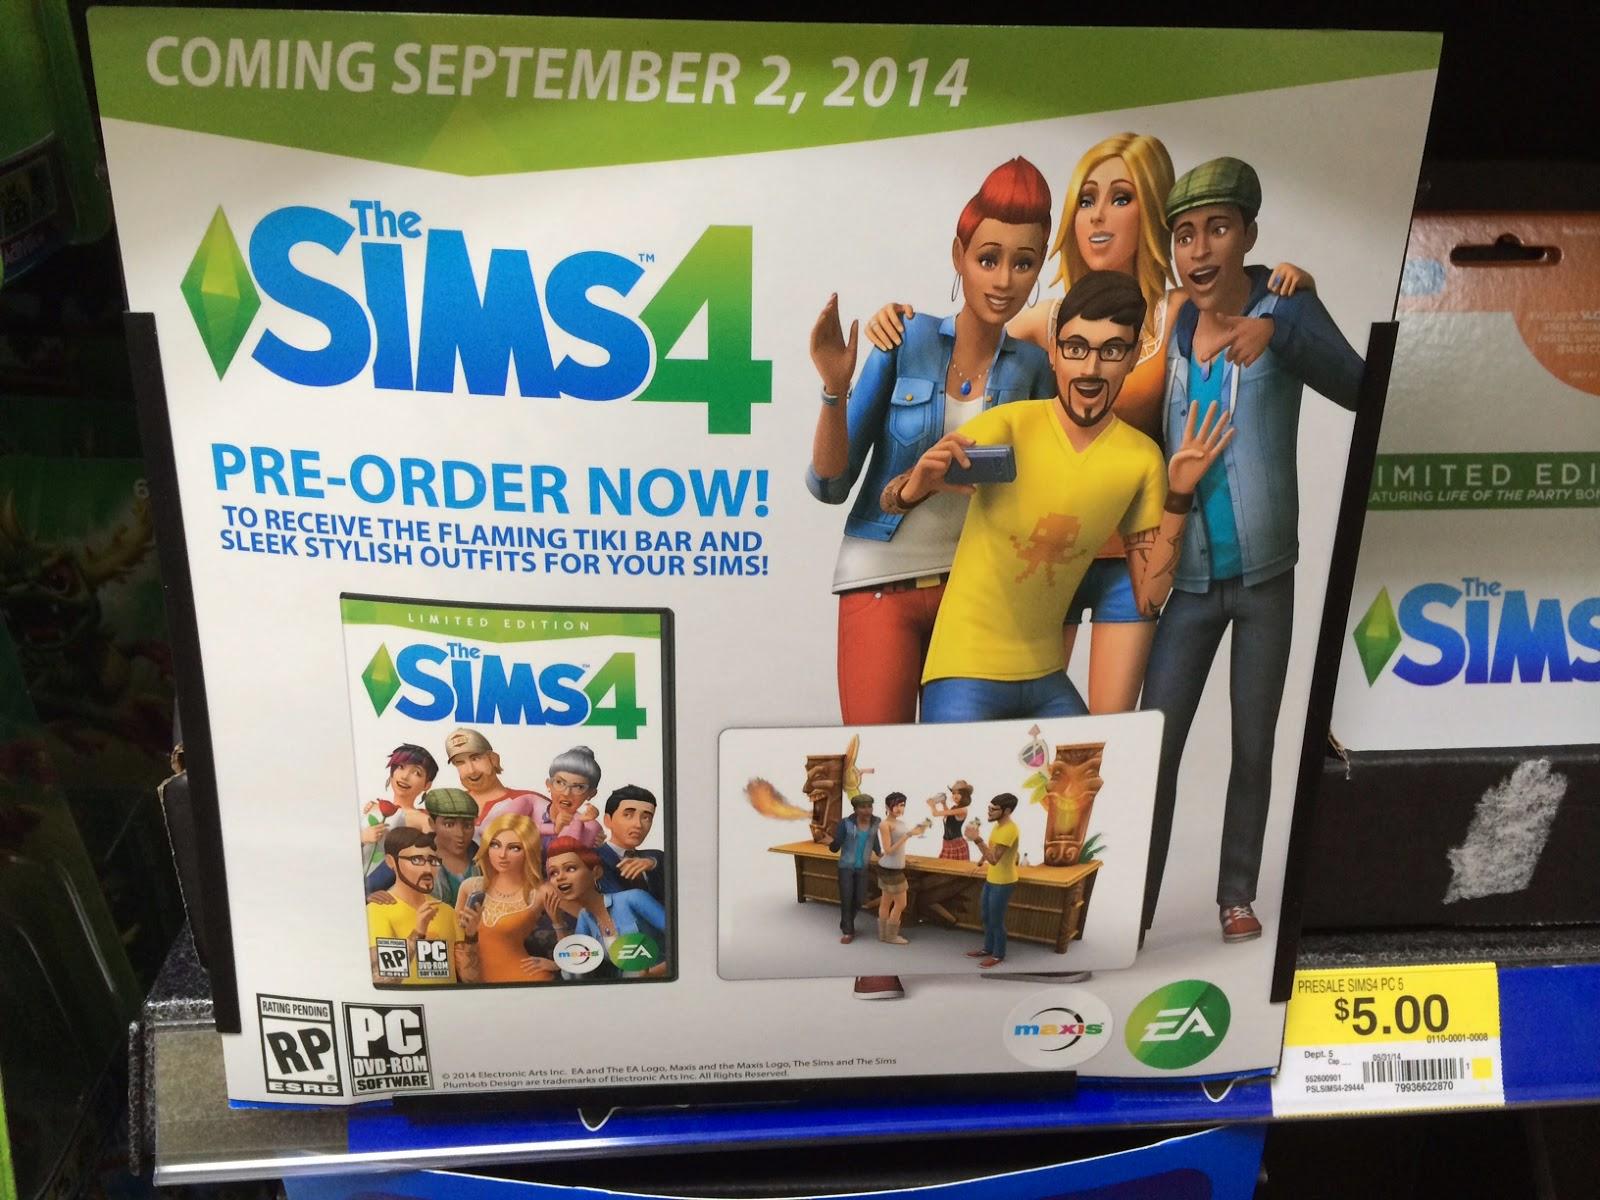 Simstias   en simsblogg/nyhetsajt: the sims 4 släpps den 2 september!